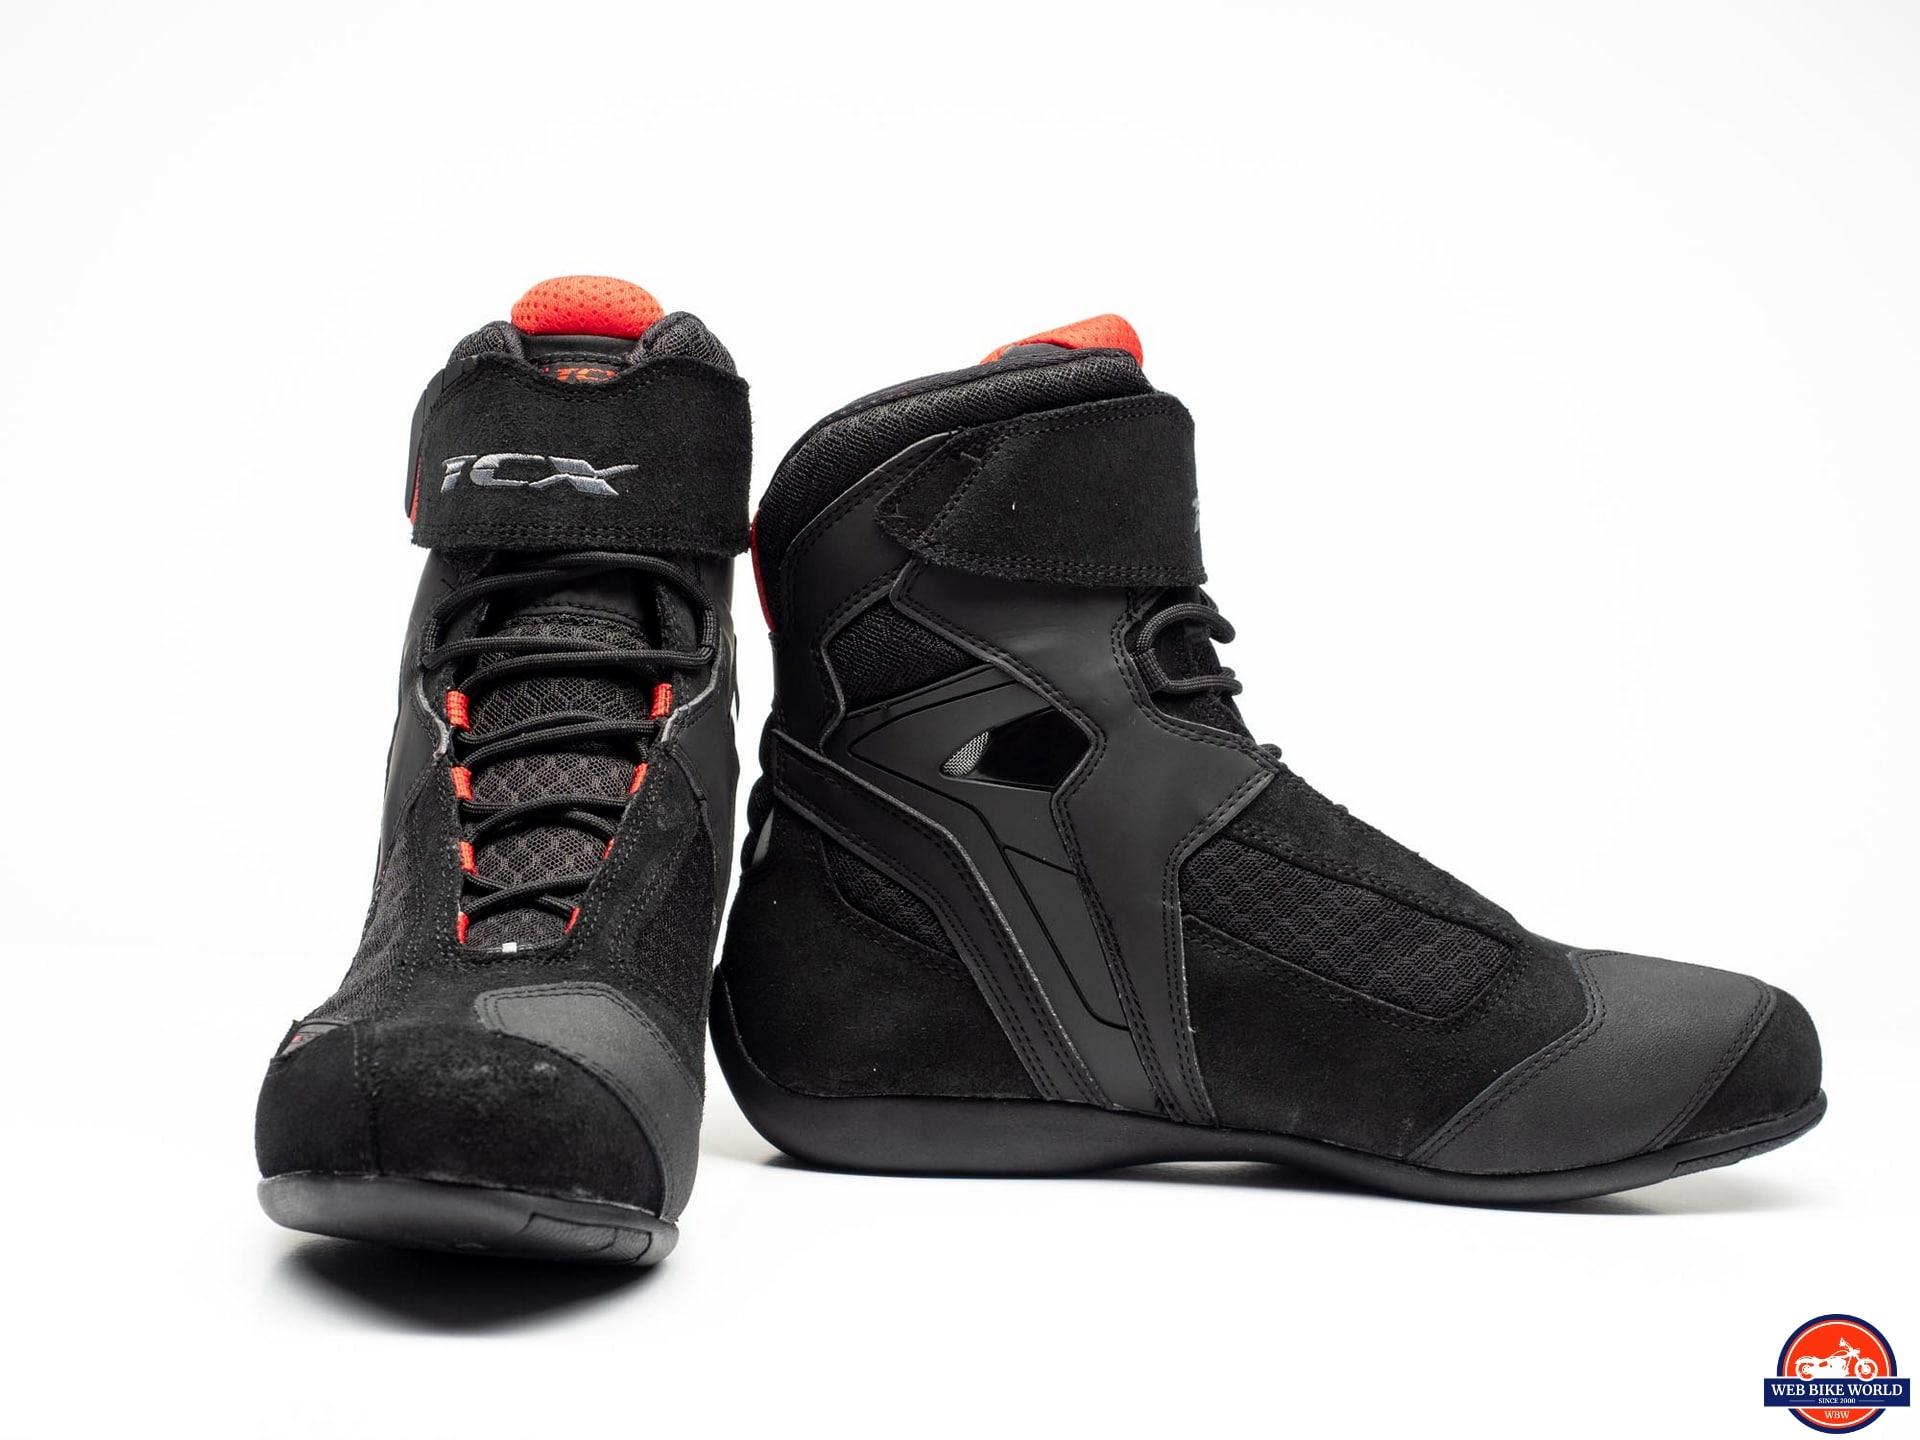 TCX Motorcycle Boots Vibe WP Black Black 36